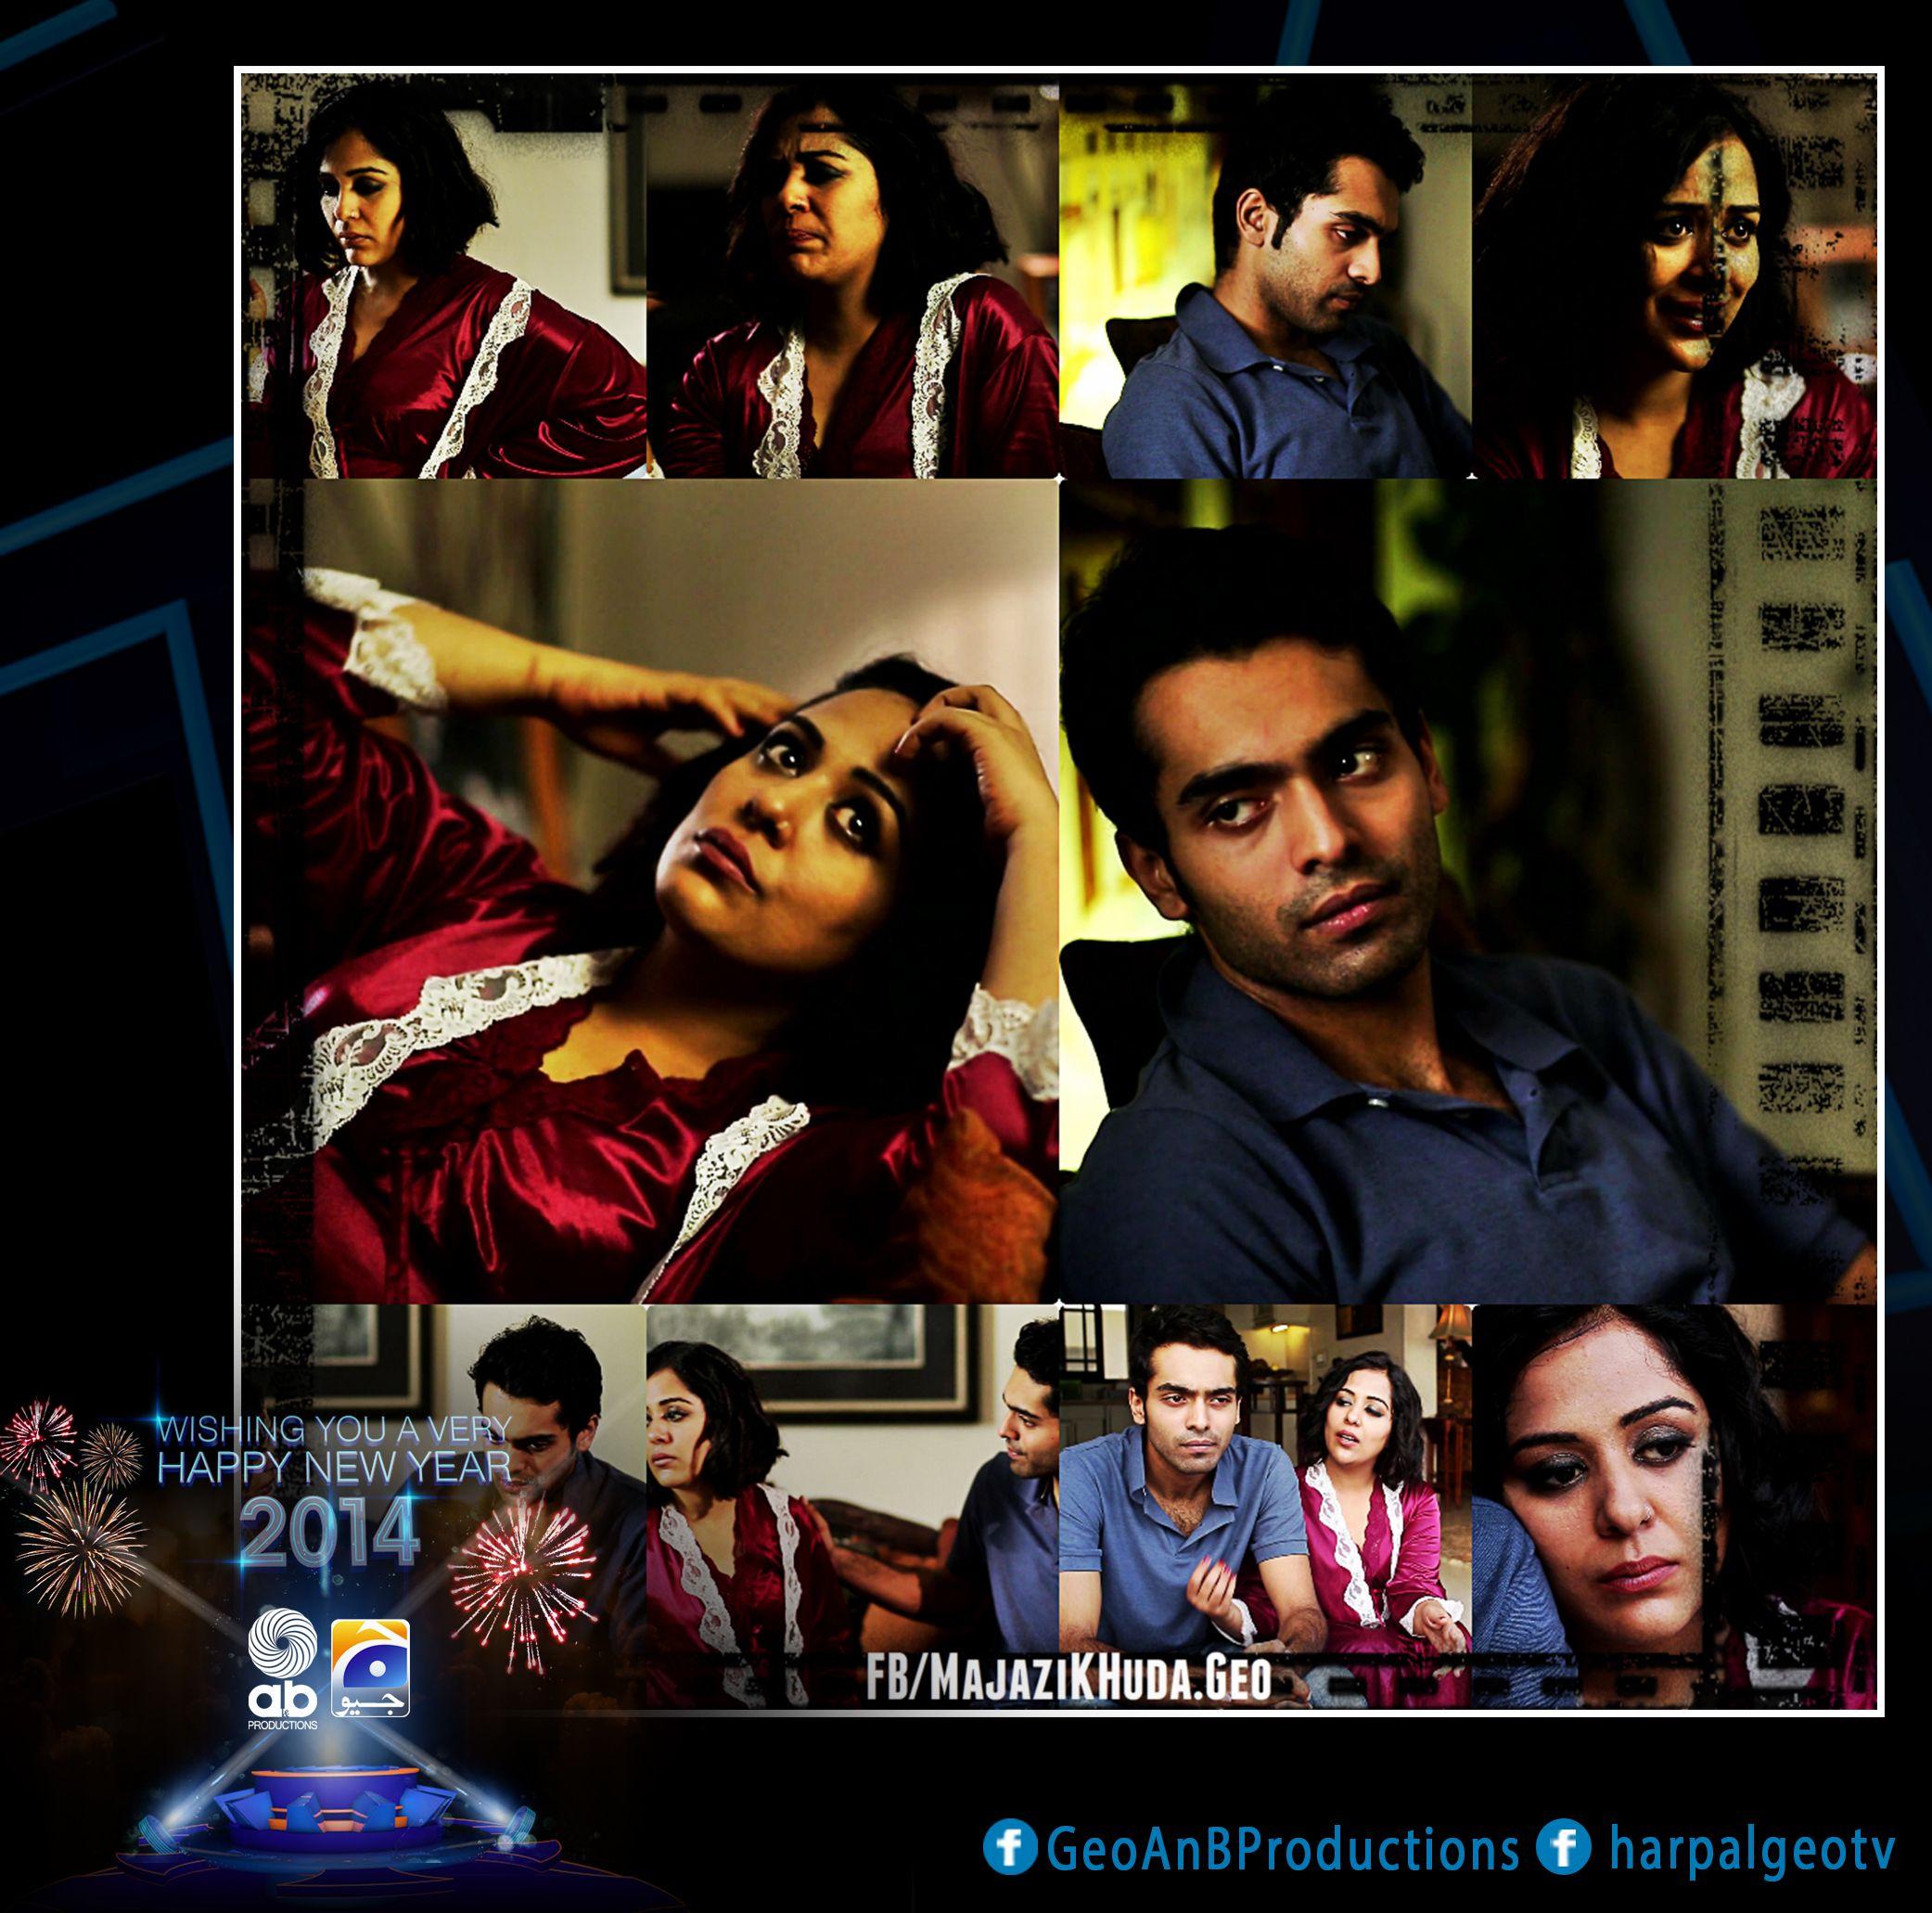 every Monday and Tuesday at 9:00 PM only on Geo TV! Starring Usman Peerzada, Atiqa Odho, Saba Hameed, Faizan Rashid Khwaja, Qurat-ul-Ain Jafferi, Syeda Yasra Rizvi, Hassan Niazi, Seema Sehar, Hashim Butt, Saira Shabbir (Neha) Directed By Wajahat Hussain Gillani Written By Imran Ali Safir